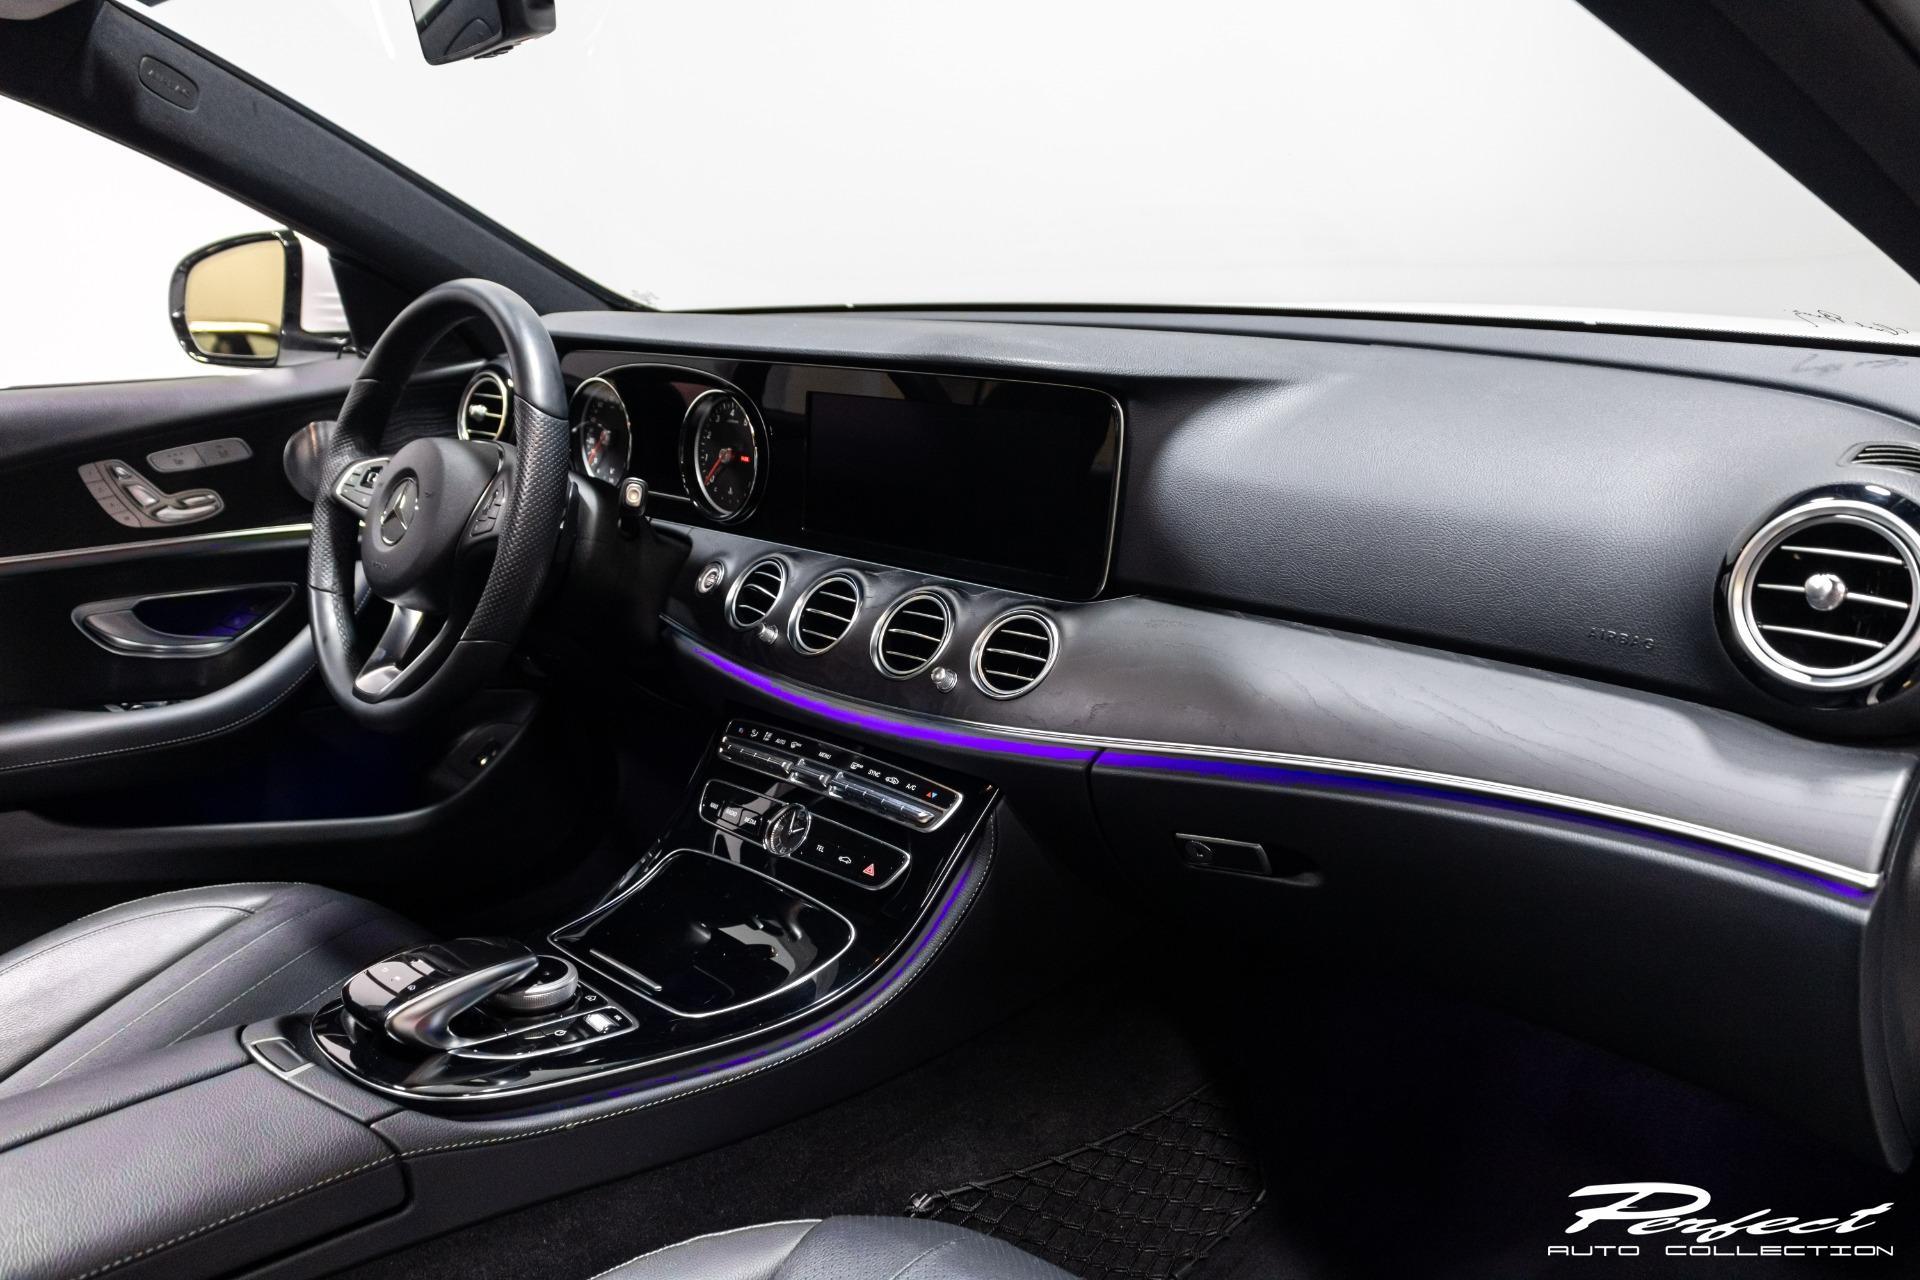 Used 2017 Mercedes Benz E Class E 300 4MATIC